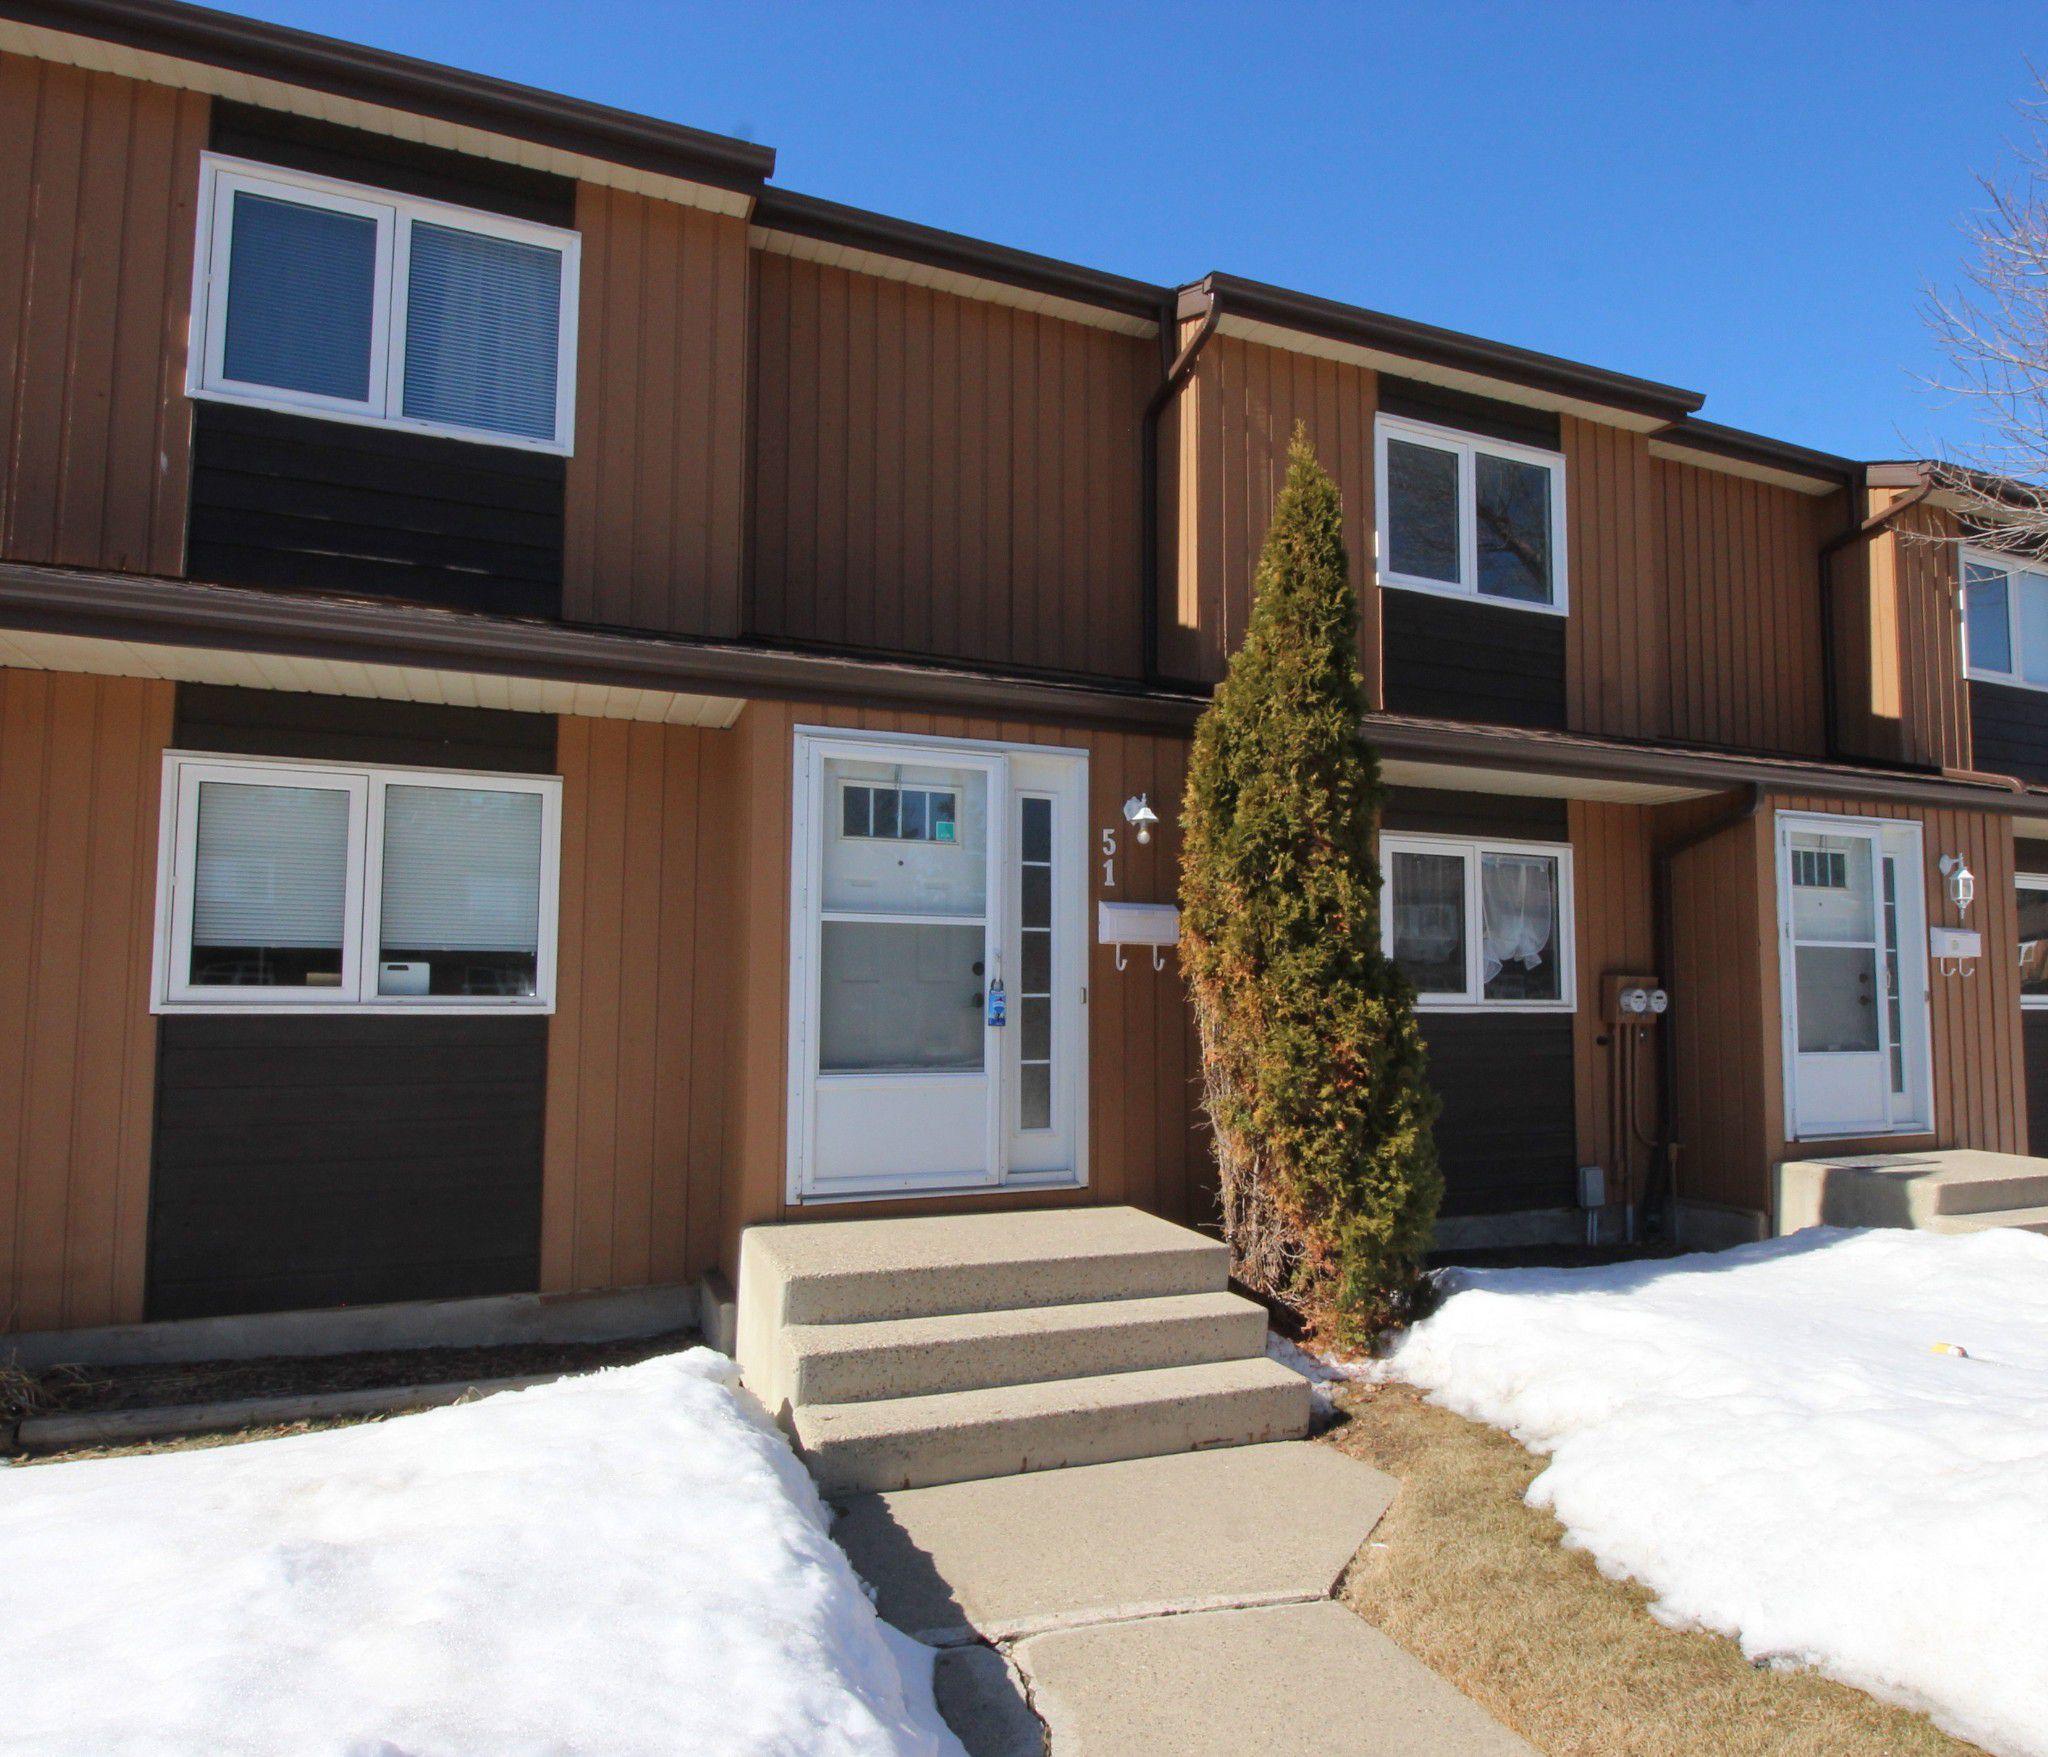 Main Photo: 51 3115 119 Street in Edmonton: Townhouse for sale